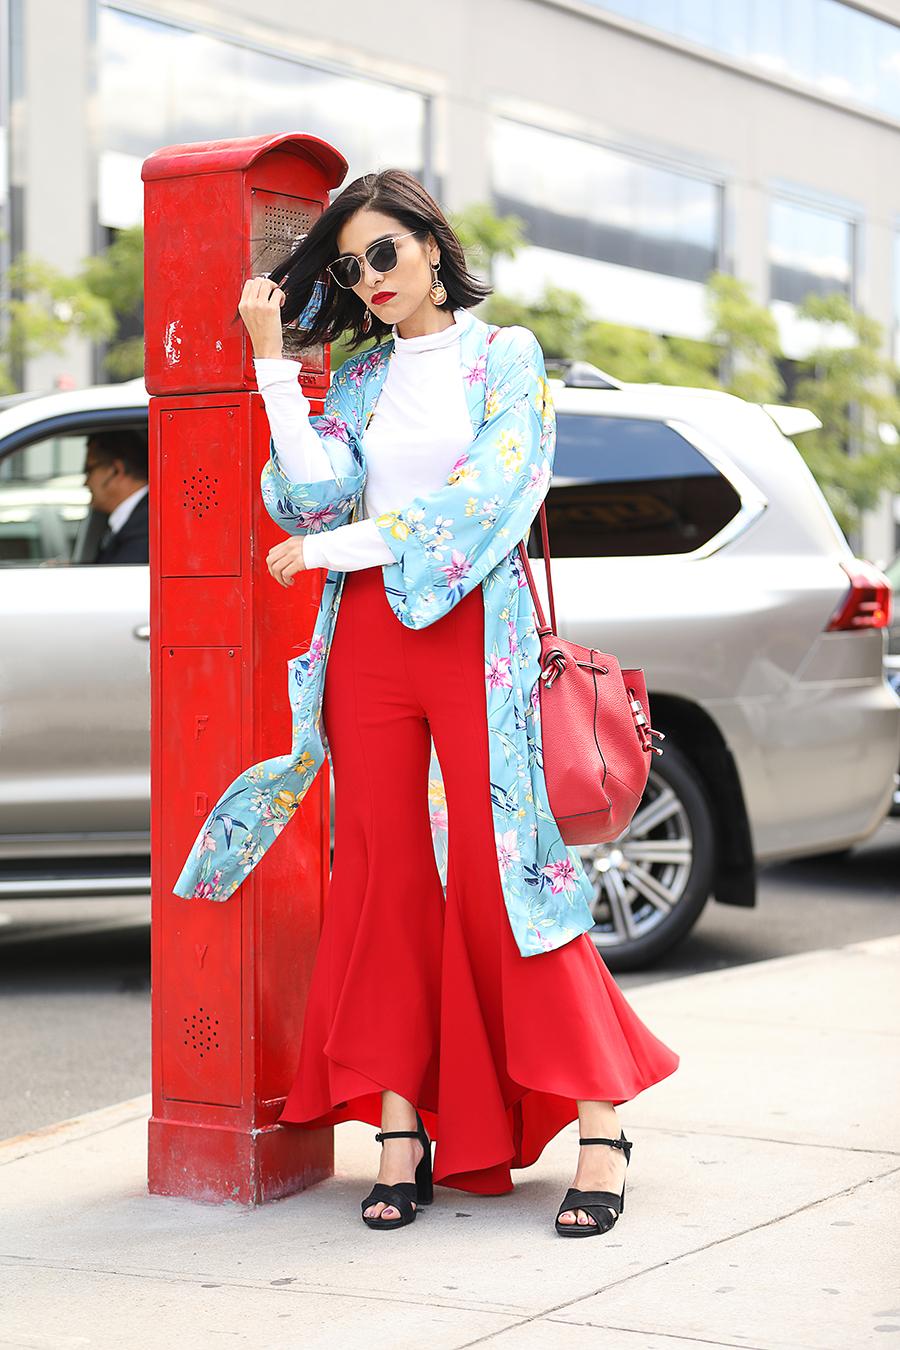 Cory_Fader_street_fashion_photography_NYC_Tony_Ward_Studio_red_pants_bell_bottom